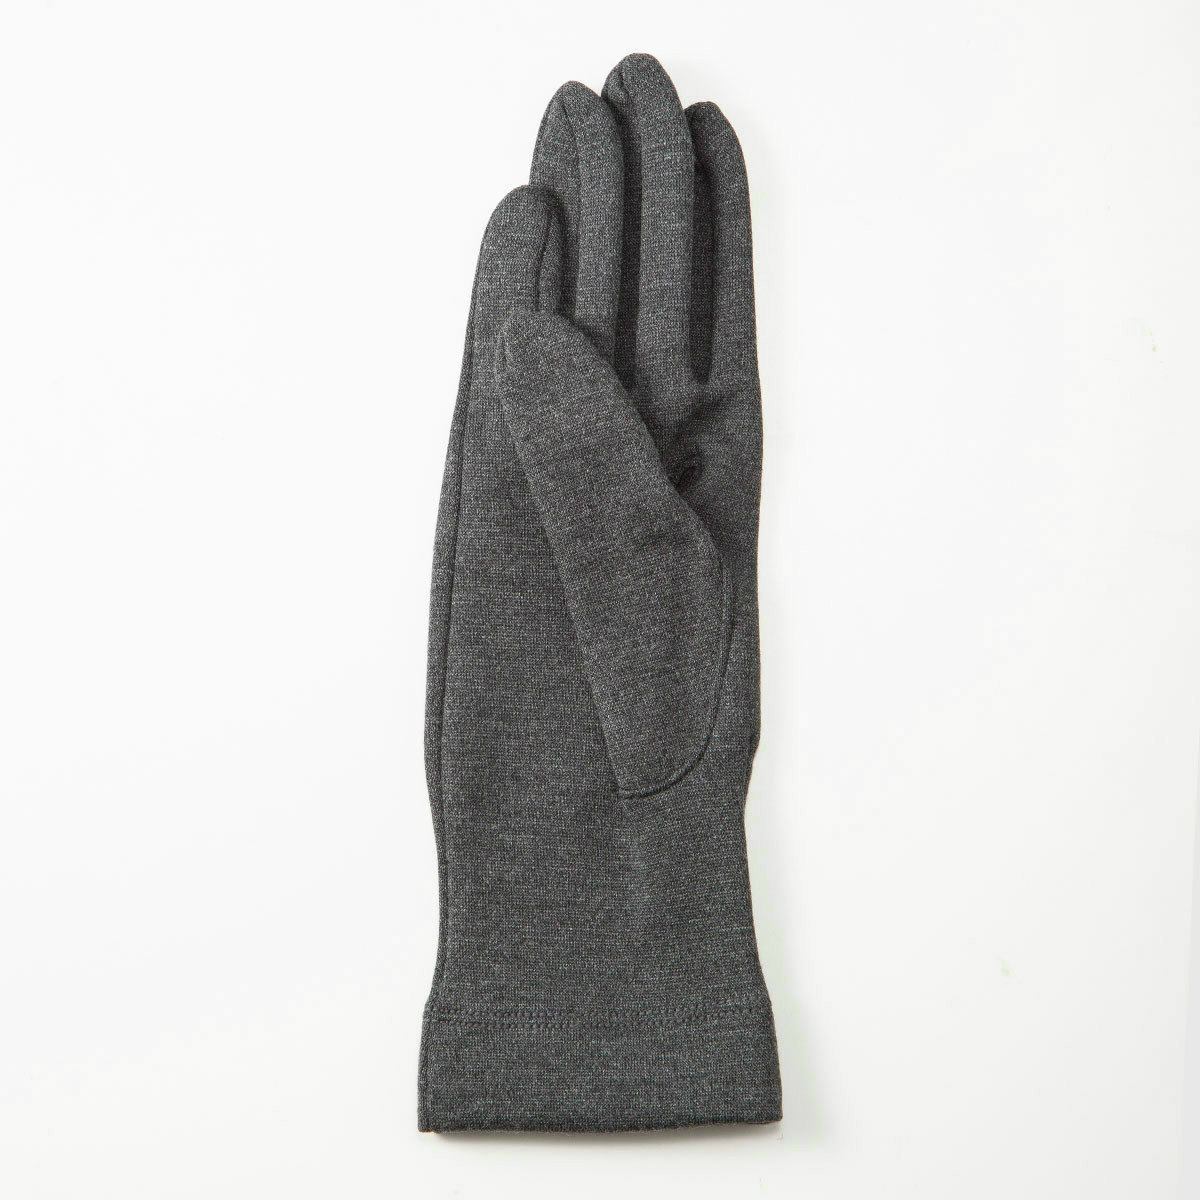 BIYUTE レディース ジャージ手袋 シンプル ちょっと長め丈 ストレッチ素材 Mサイズ 全3色